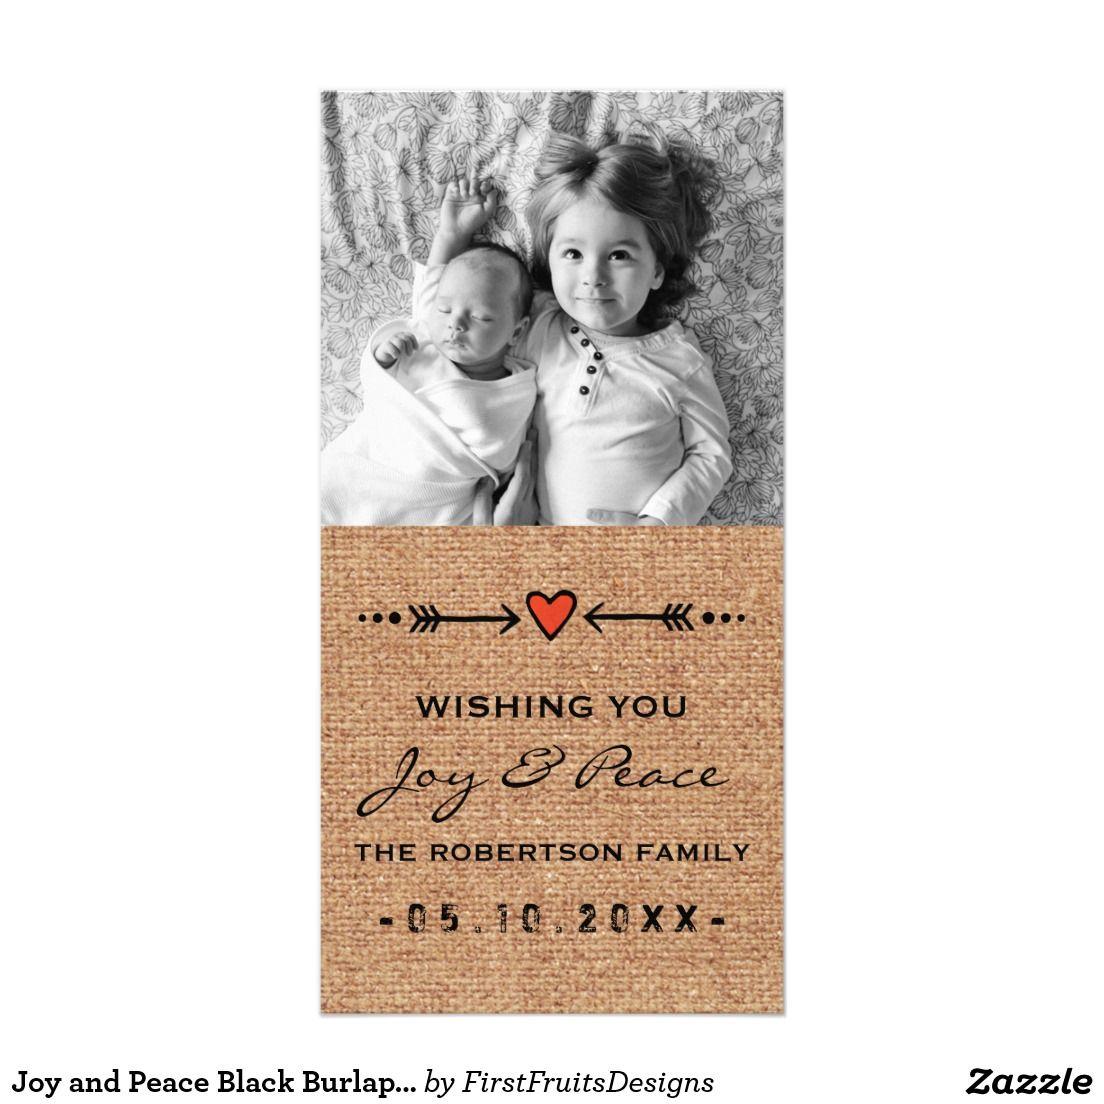 Joy and Peace Black Burlap Arrows Hearts Paper Photo Card